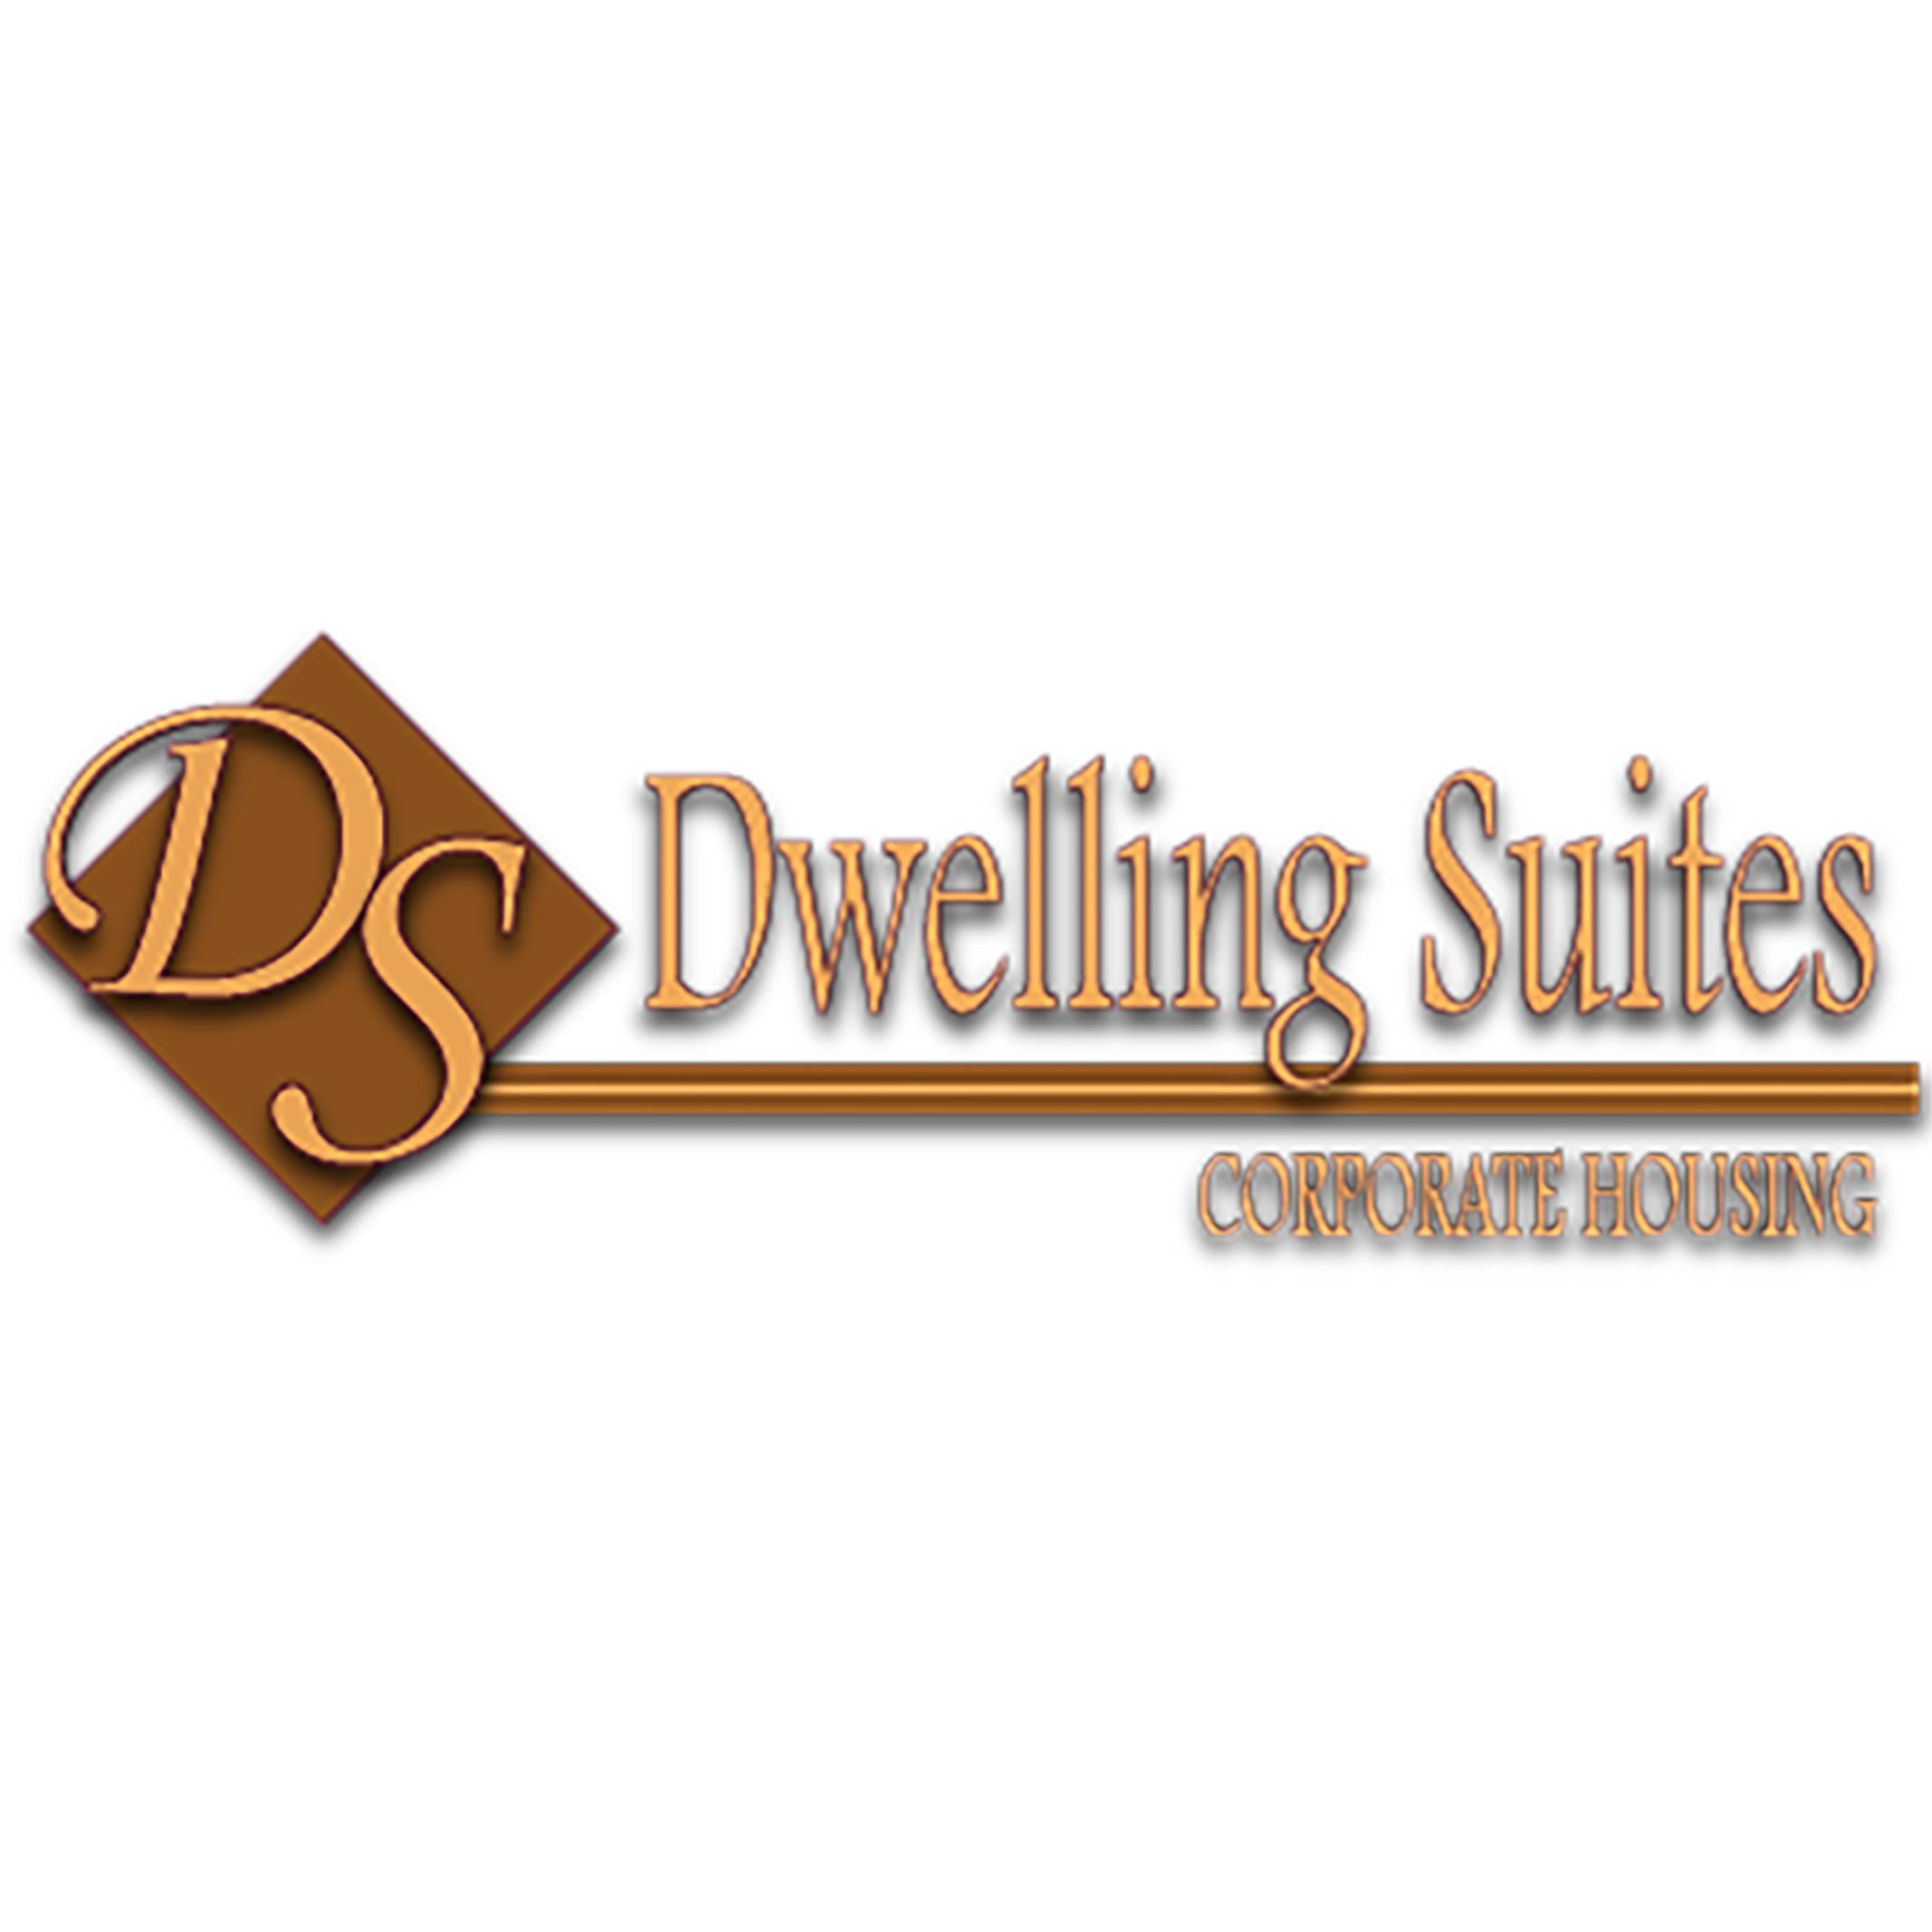 Dwelling Suites Coupons Near Me In San Antonio 8coupons